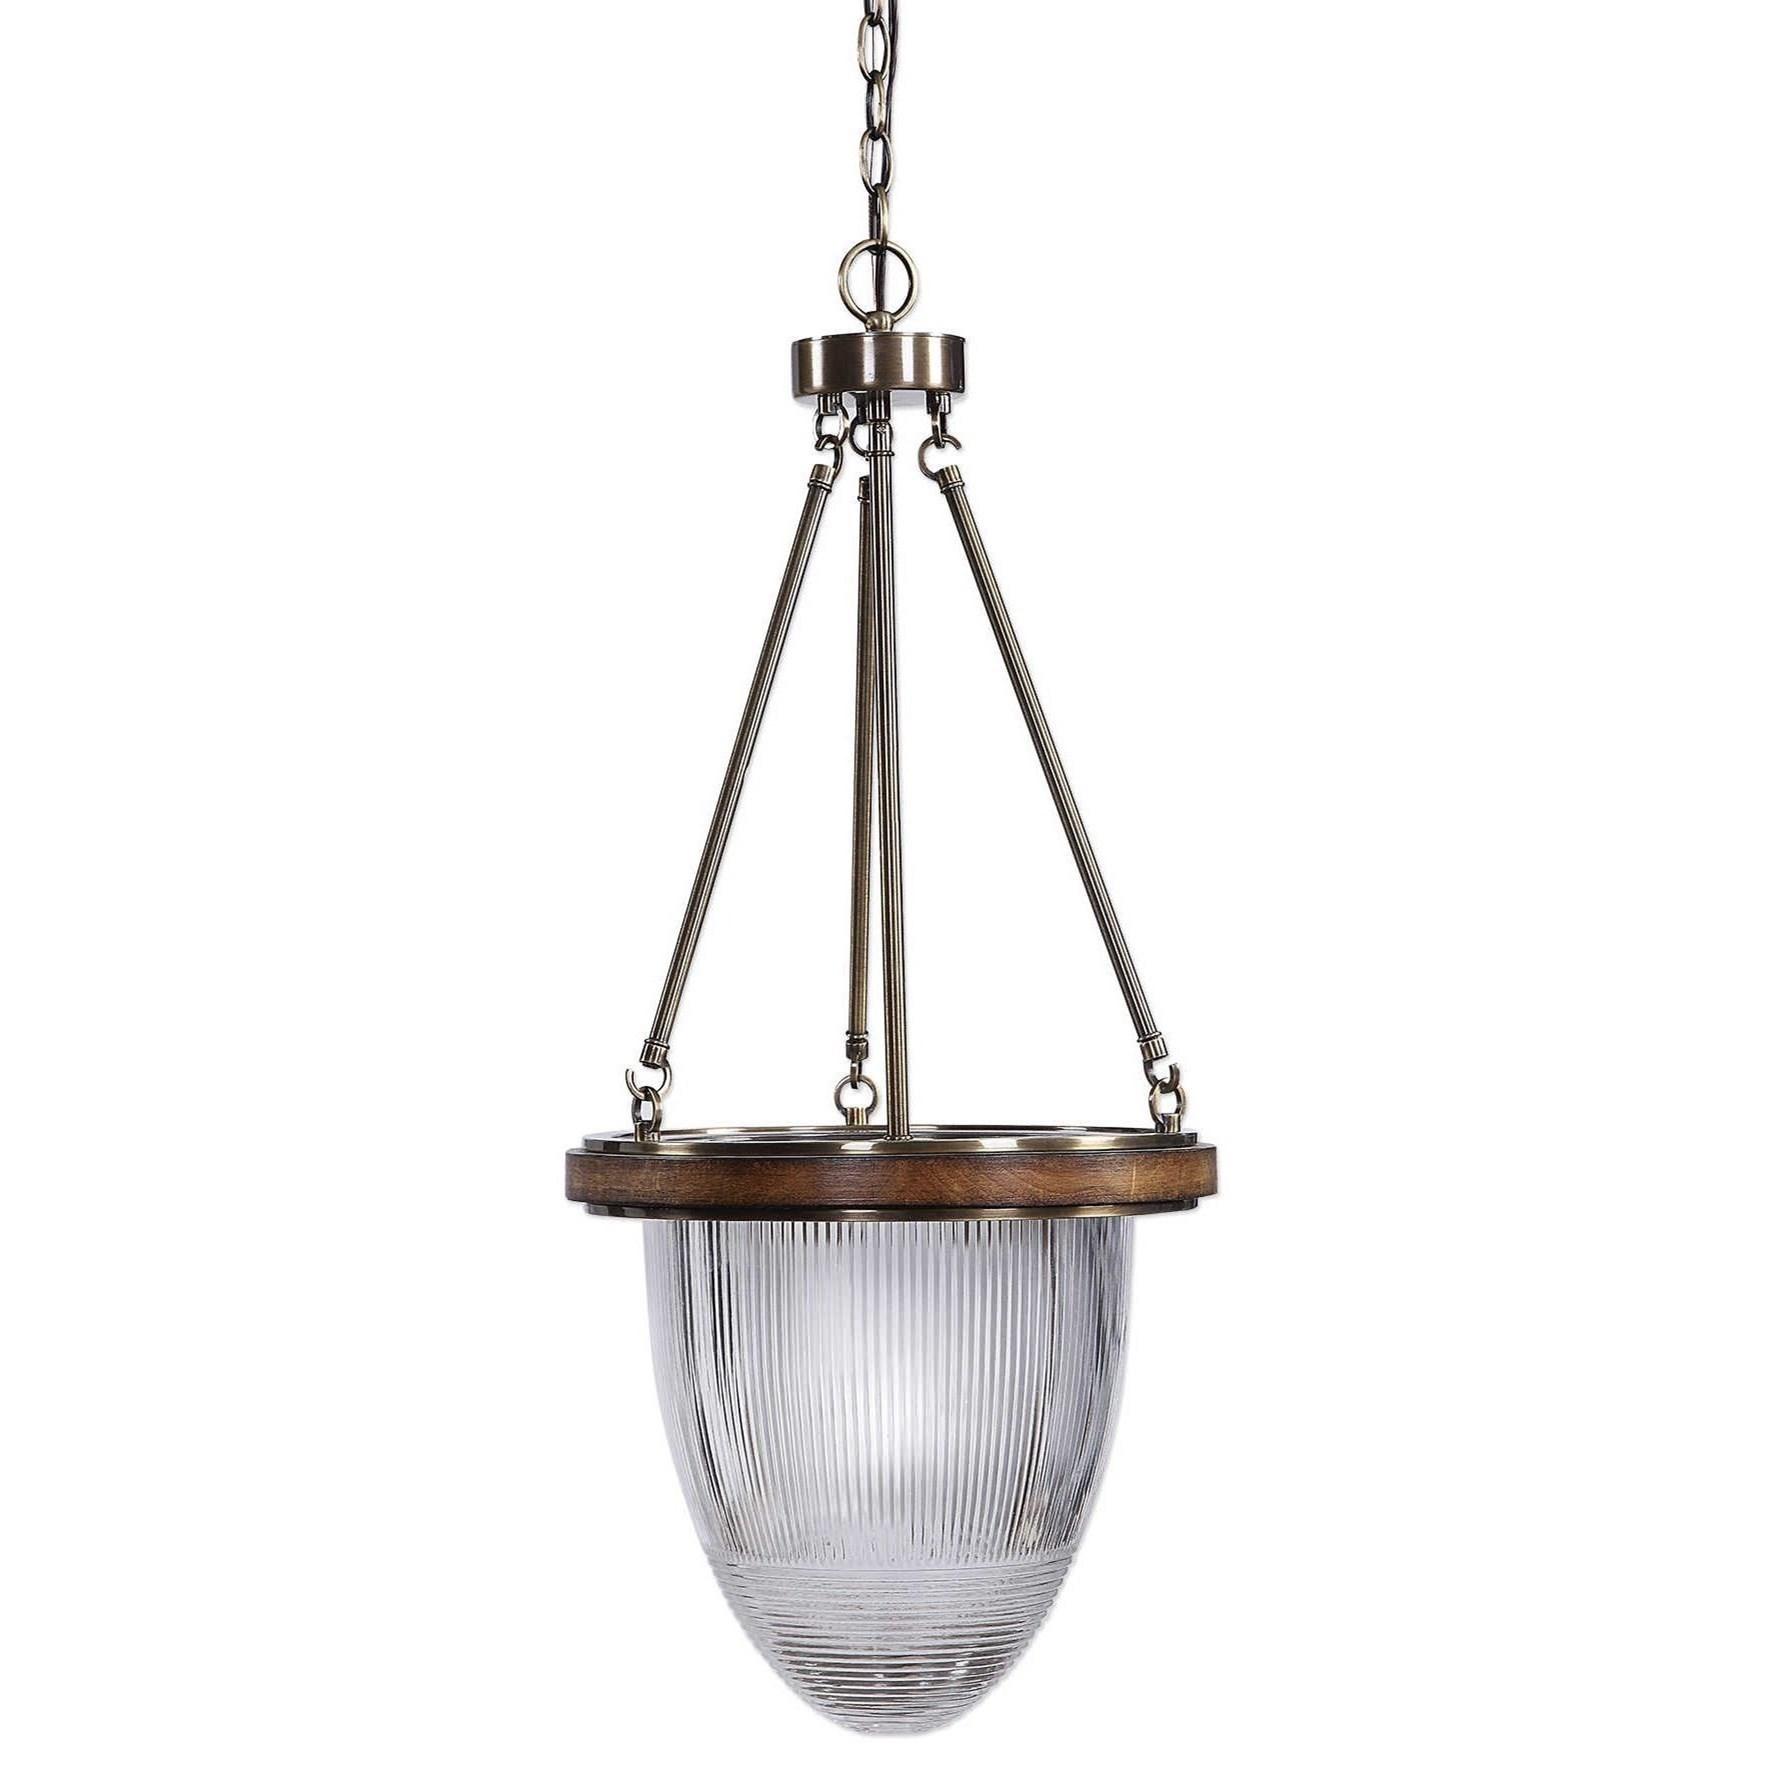 Clemmie 1 Light Industrial Pendant